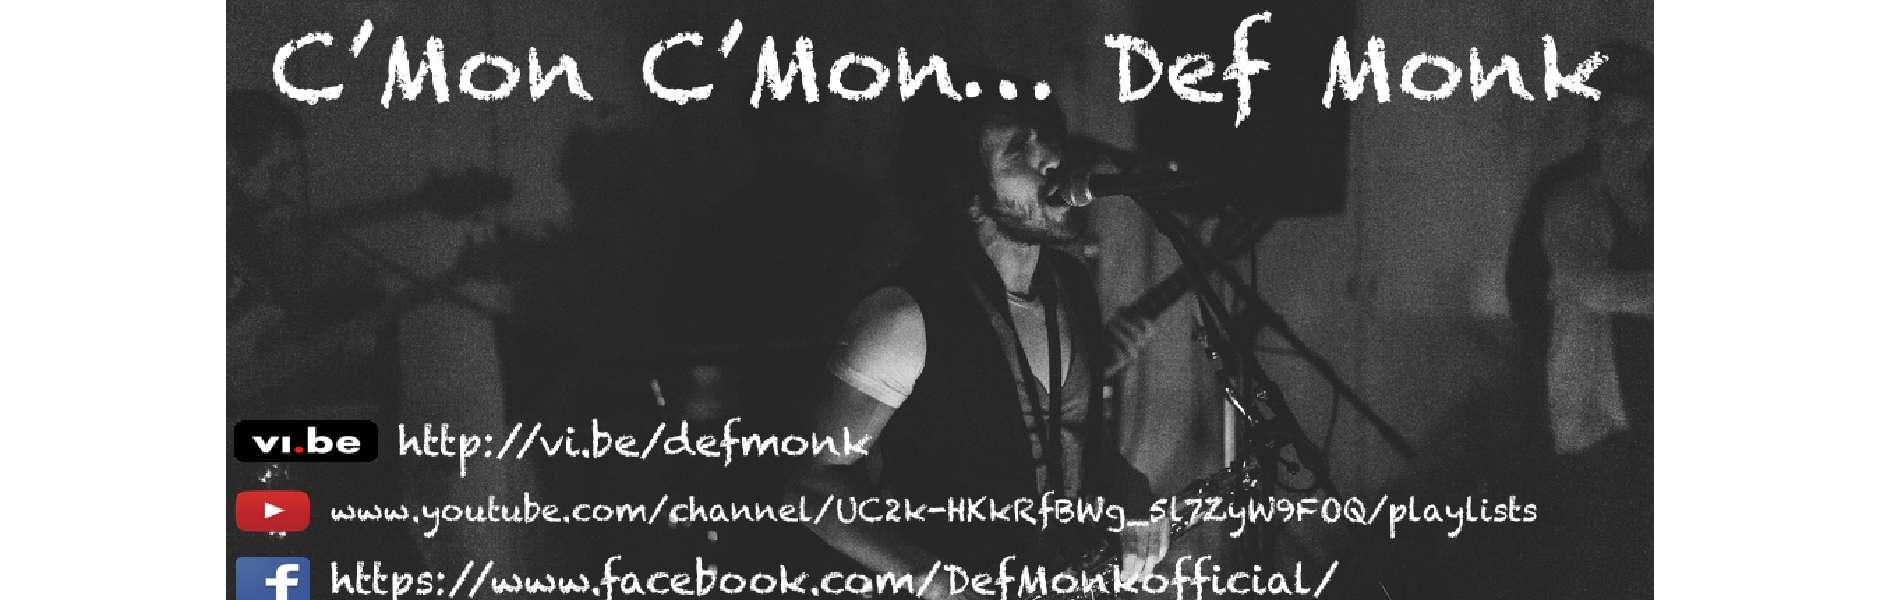 Def Monk